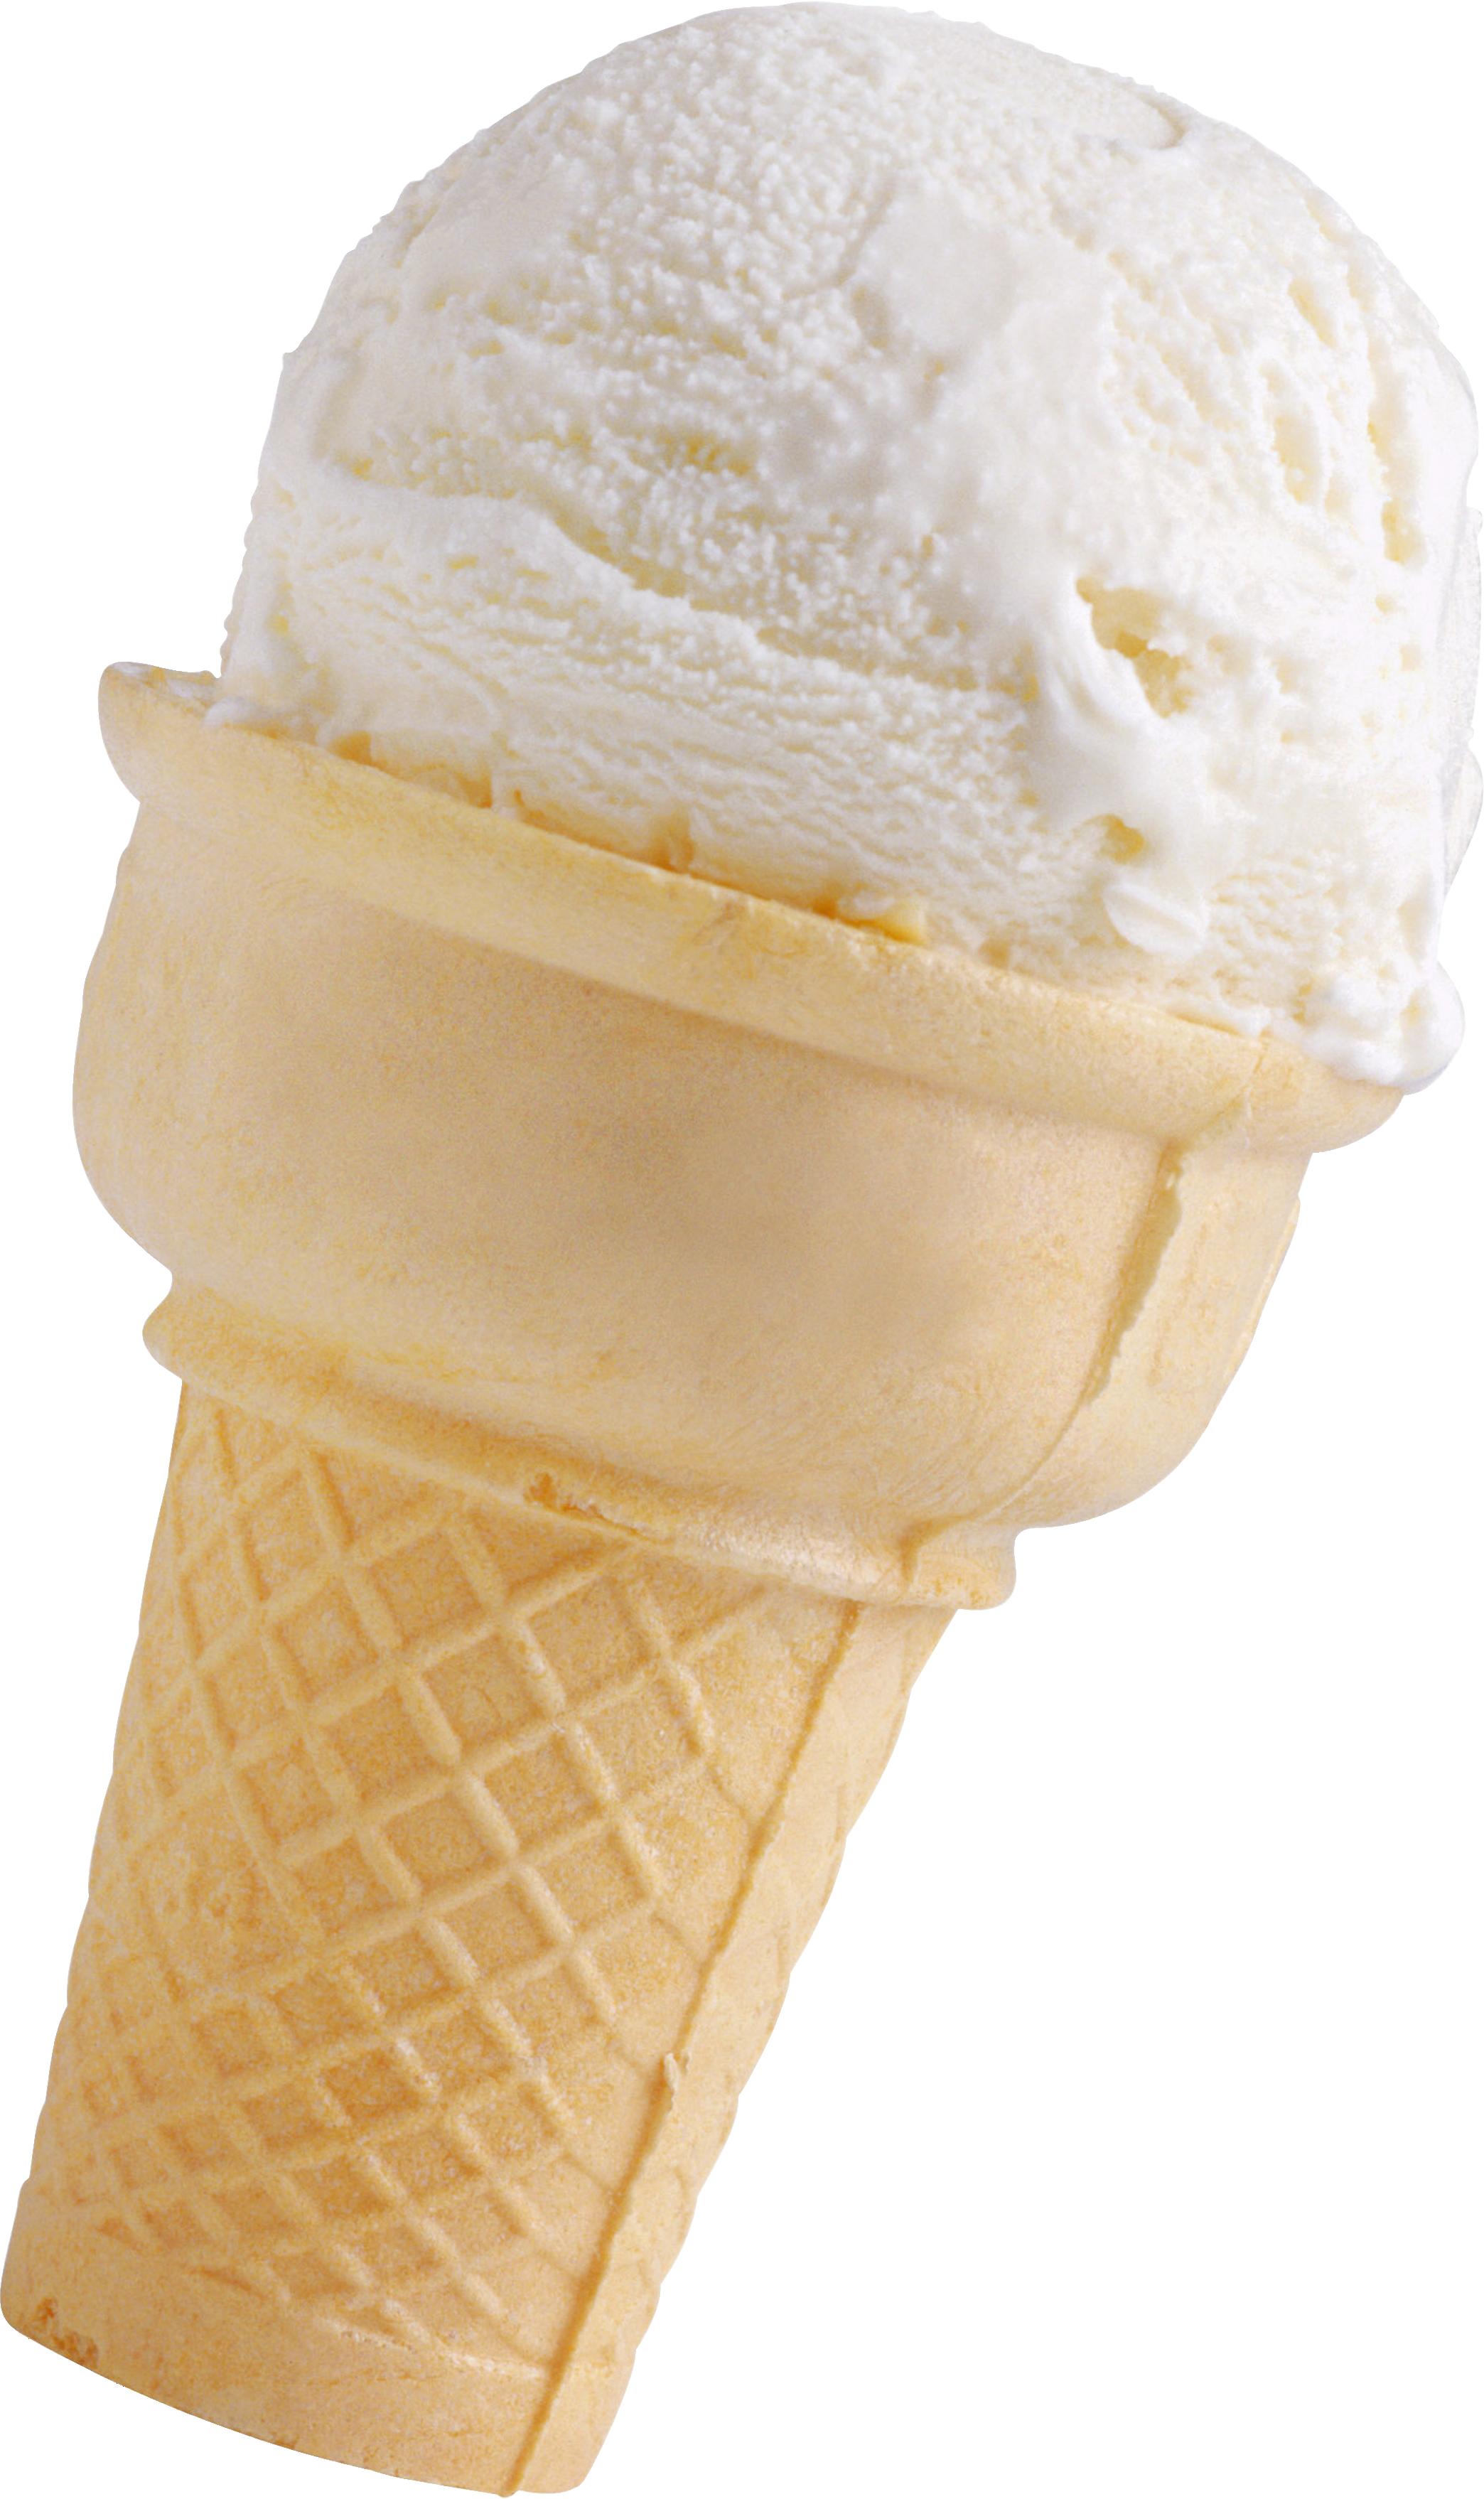 Ice Cream Png Image Cinnamon Ice Cream Recipe Ice Cream Cinnamon Ice Cream